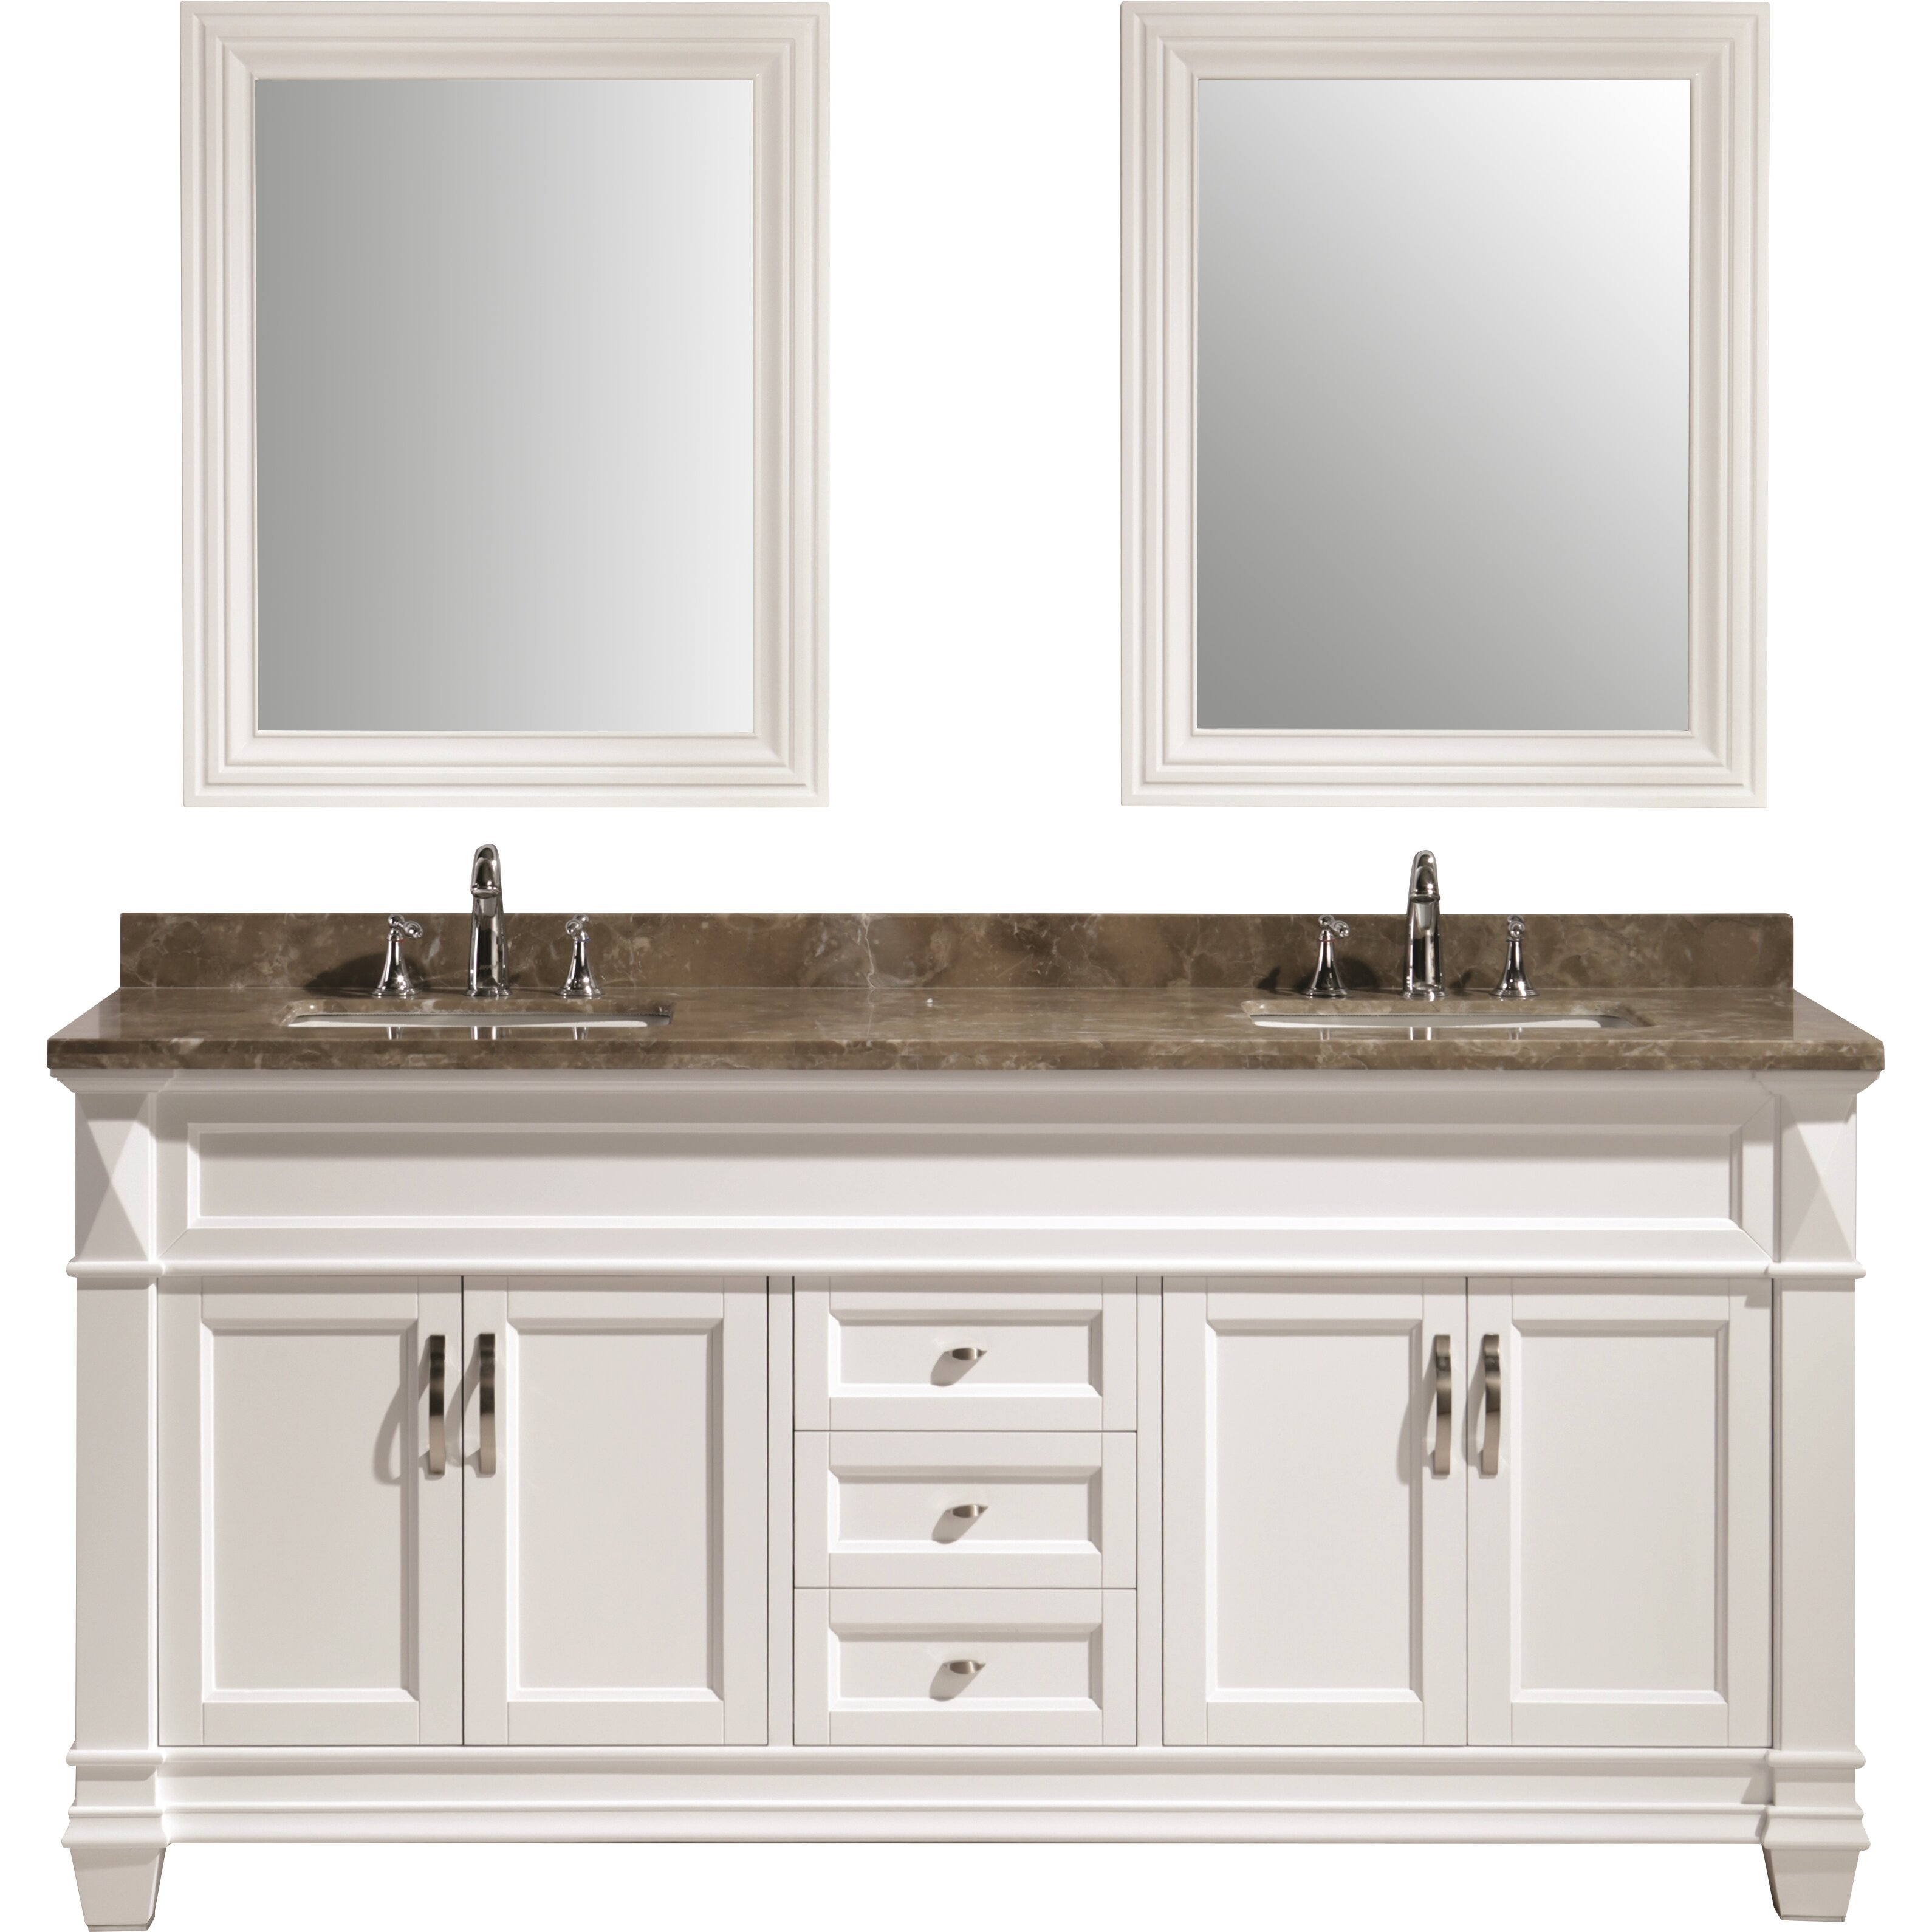 Unique Bathroom Vanities  Buy Bathroom Vanity Furniture Amp Cabinets  RGM